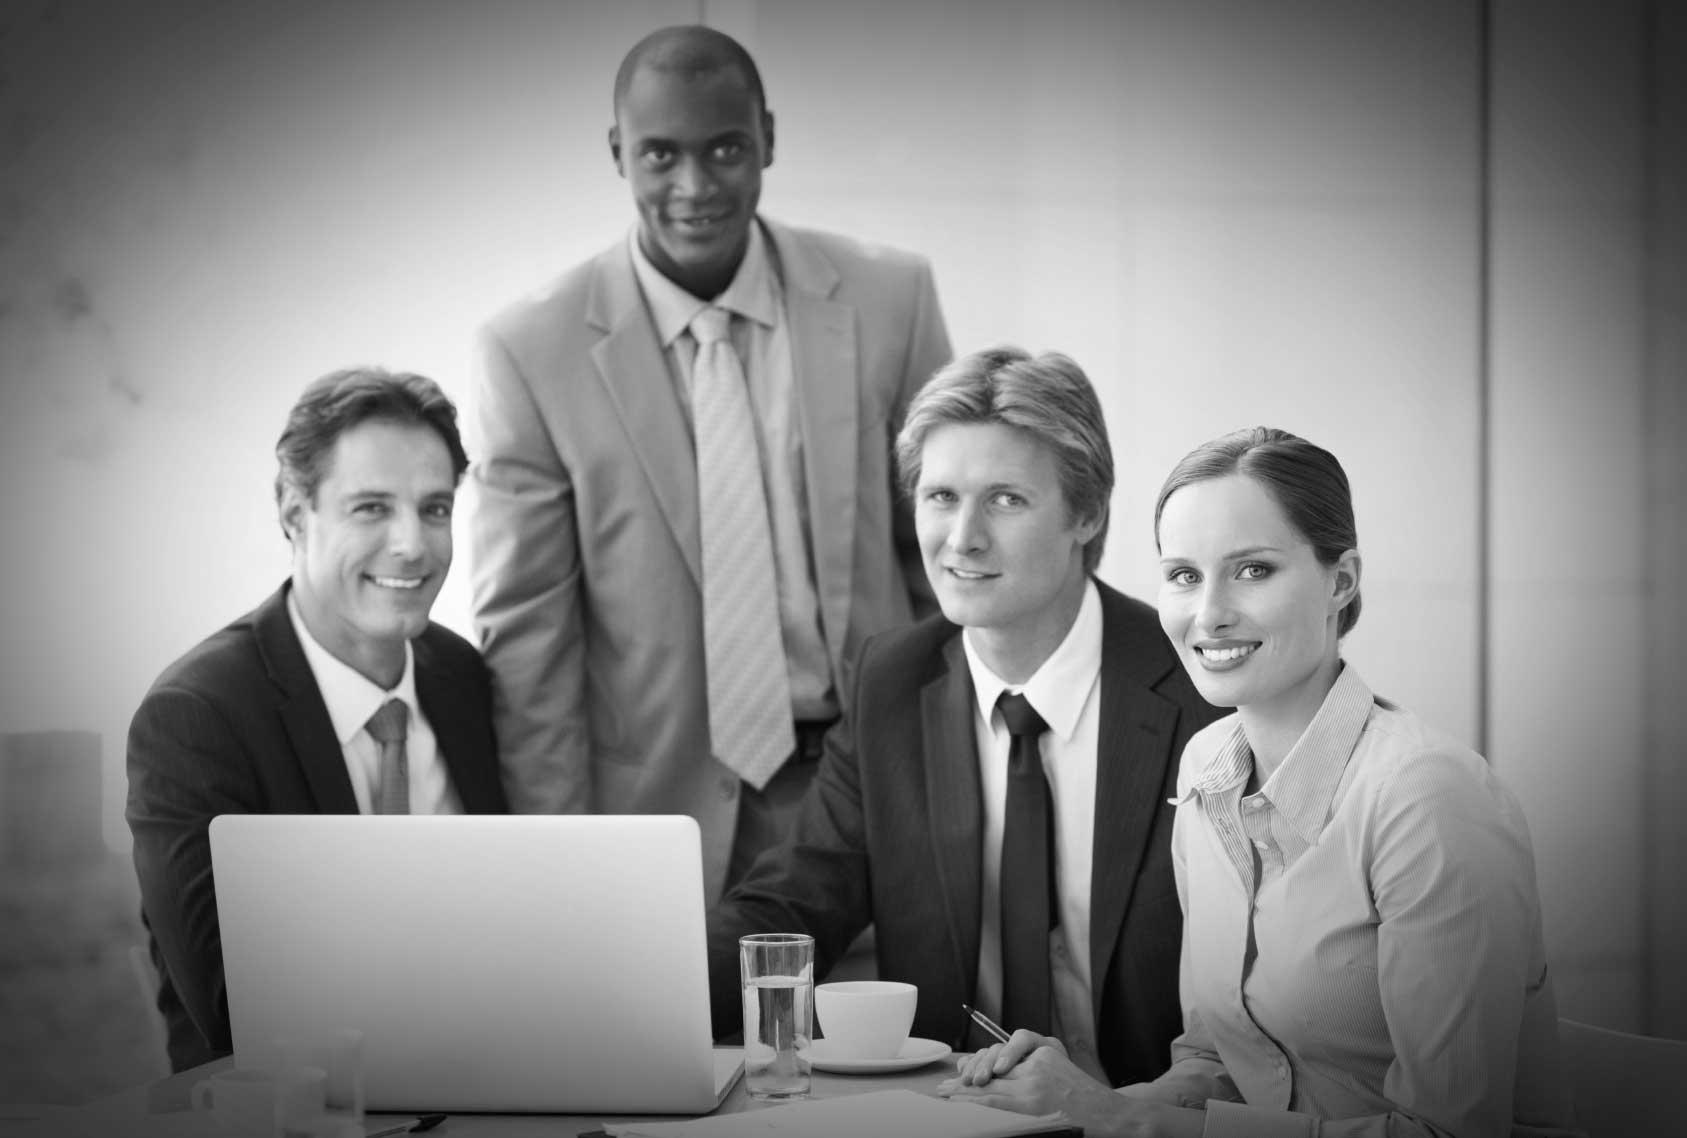 kansas-city-workers-compensation-attorneys